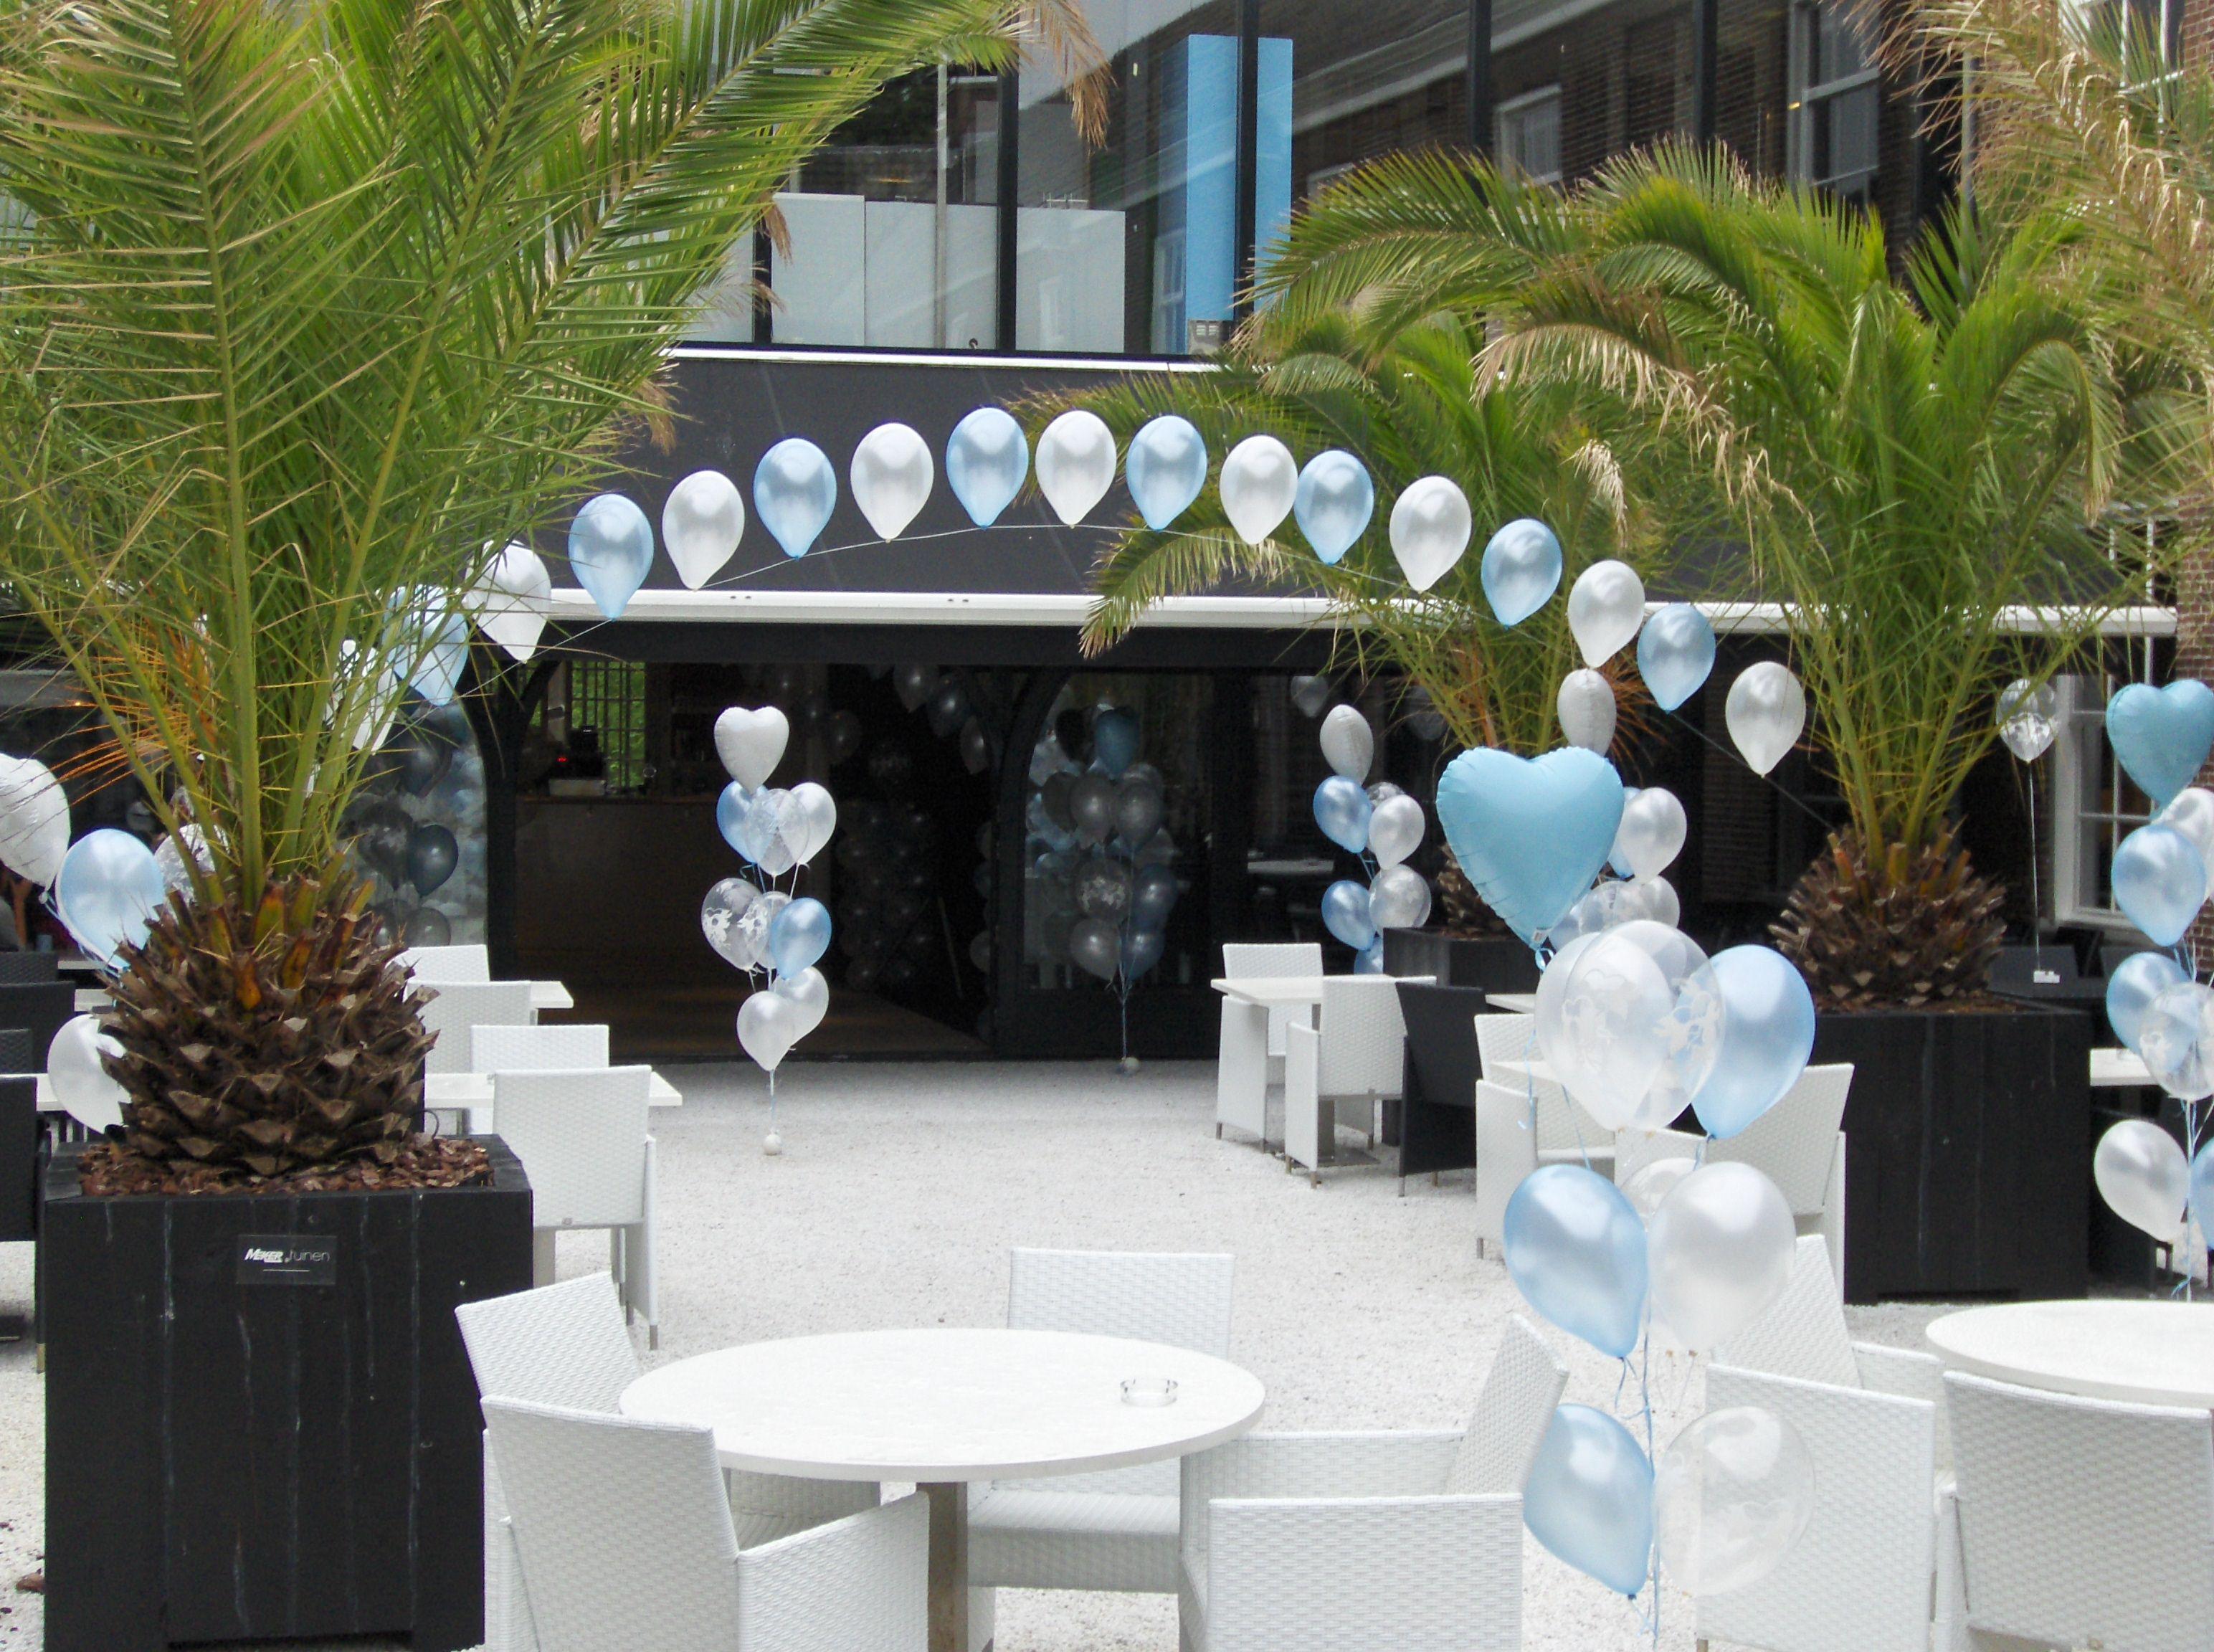 Trosjes Heliumballonnen En Ballonsliert Ballondecoraties Ballonnen Huwelijk